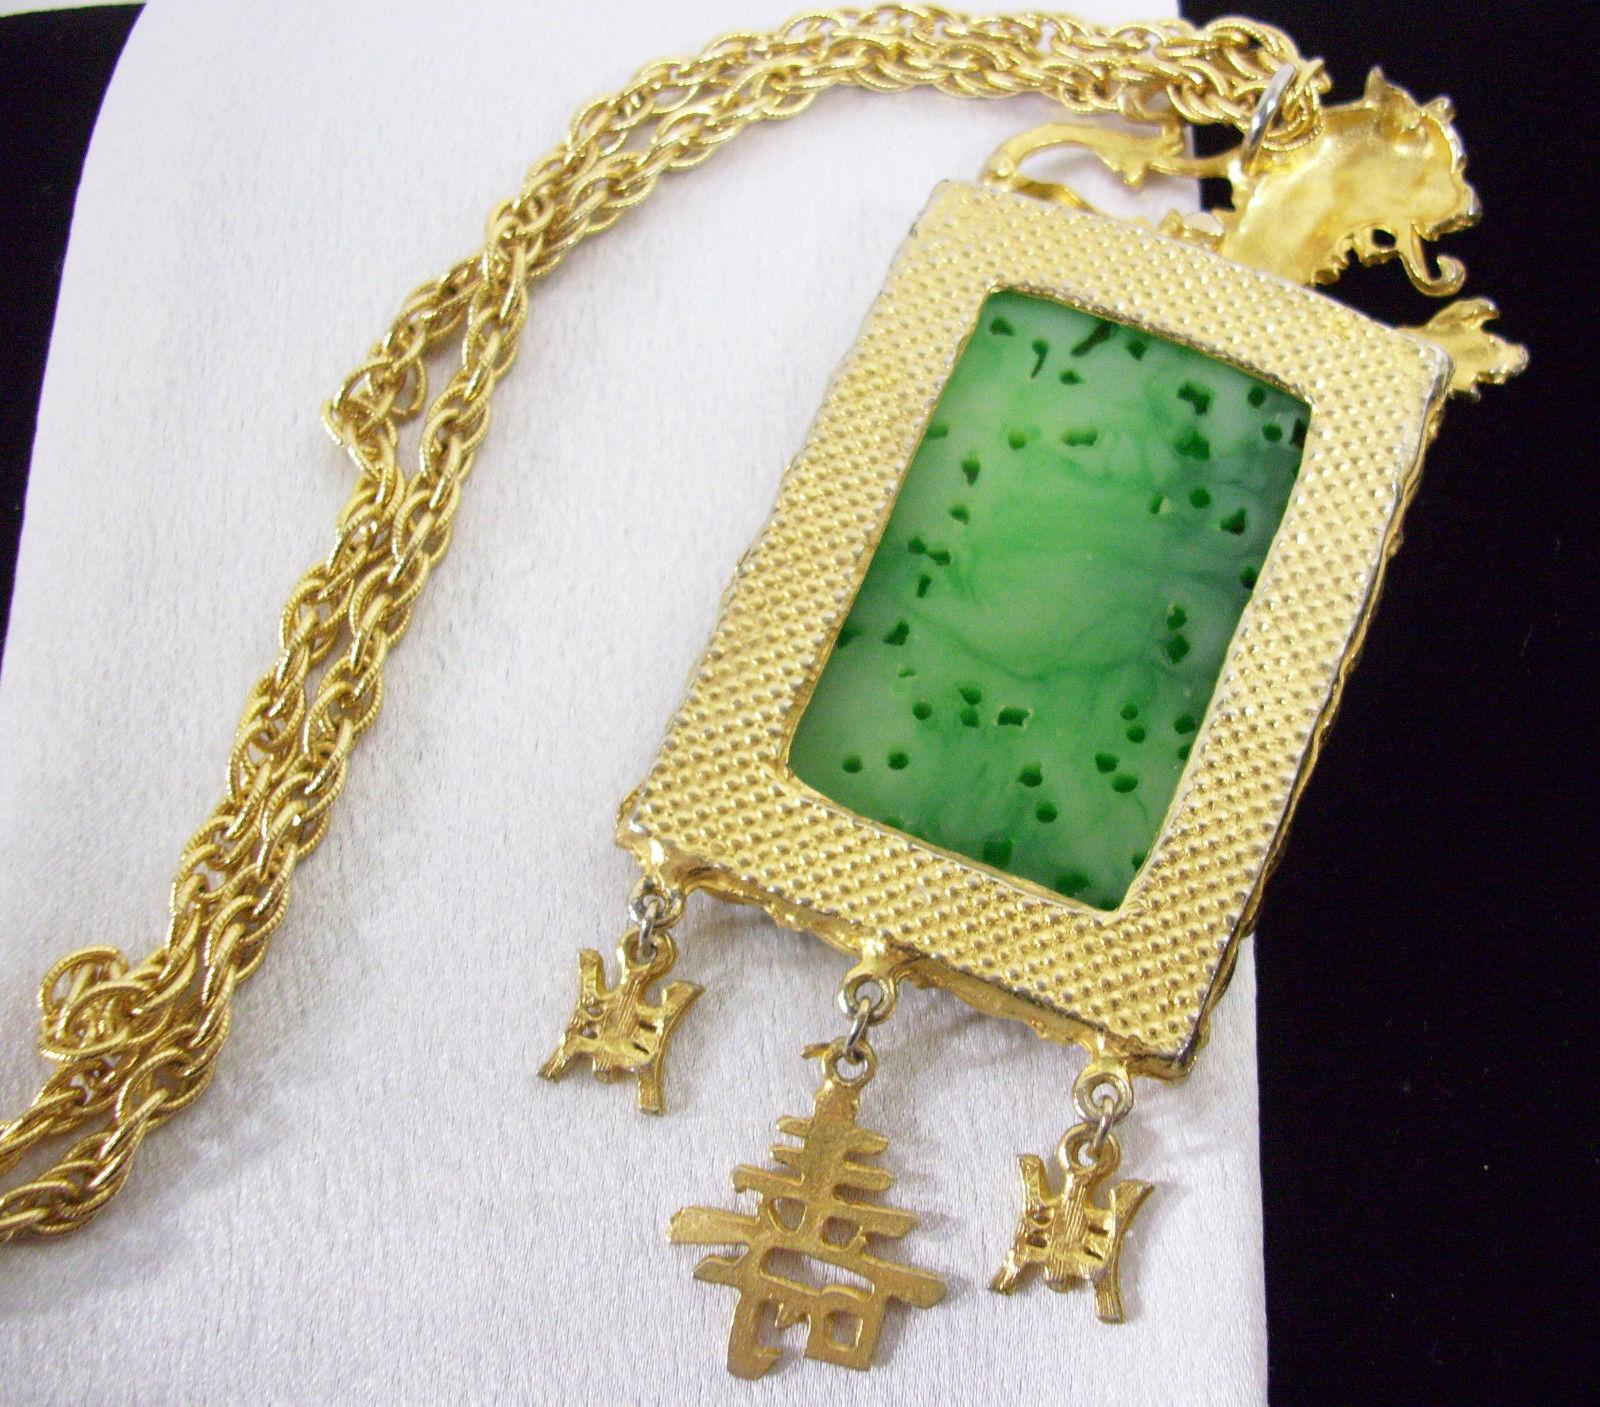 HATTIE CARNEGIE Jade Green DRAGON Pendant Necklace Dangle Asian Vintage Unsigned